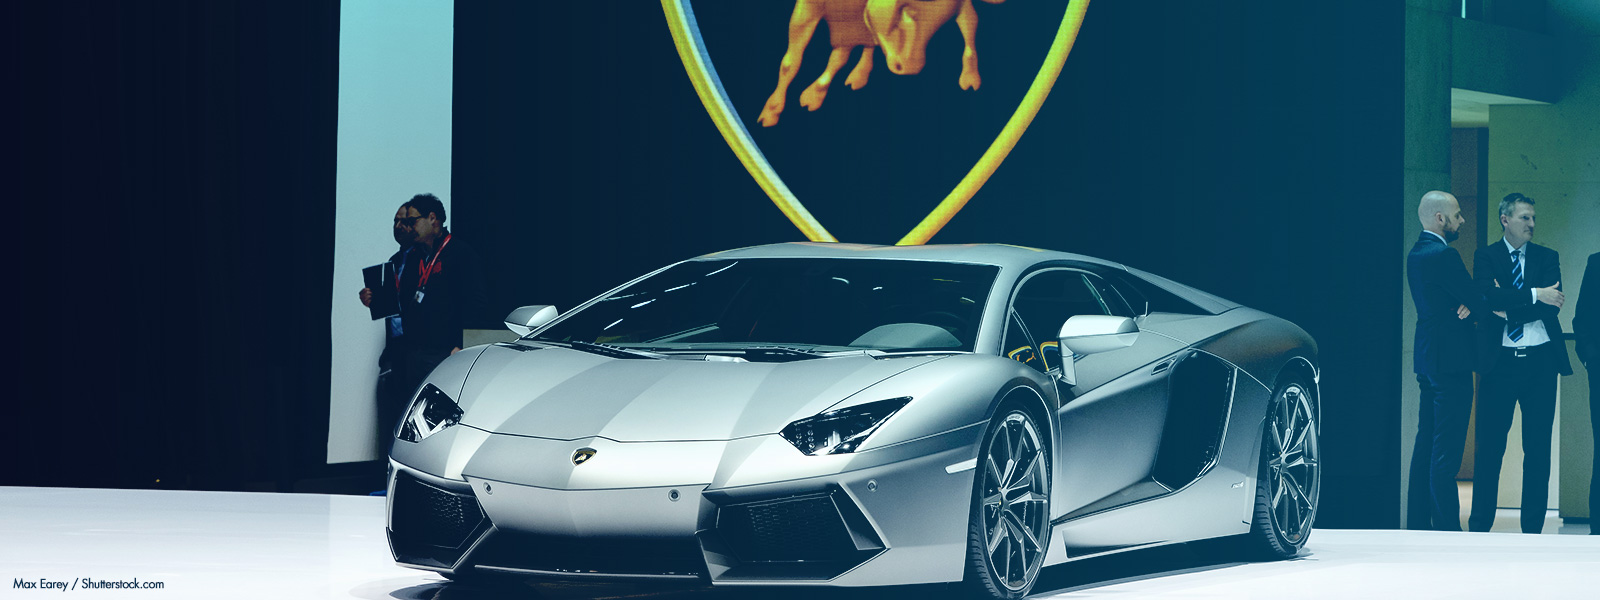 Lamborghini comemorativa esgota antes do lançamento